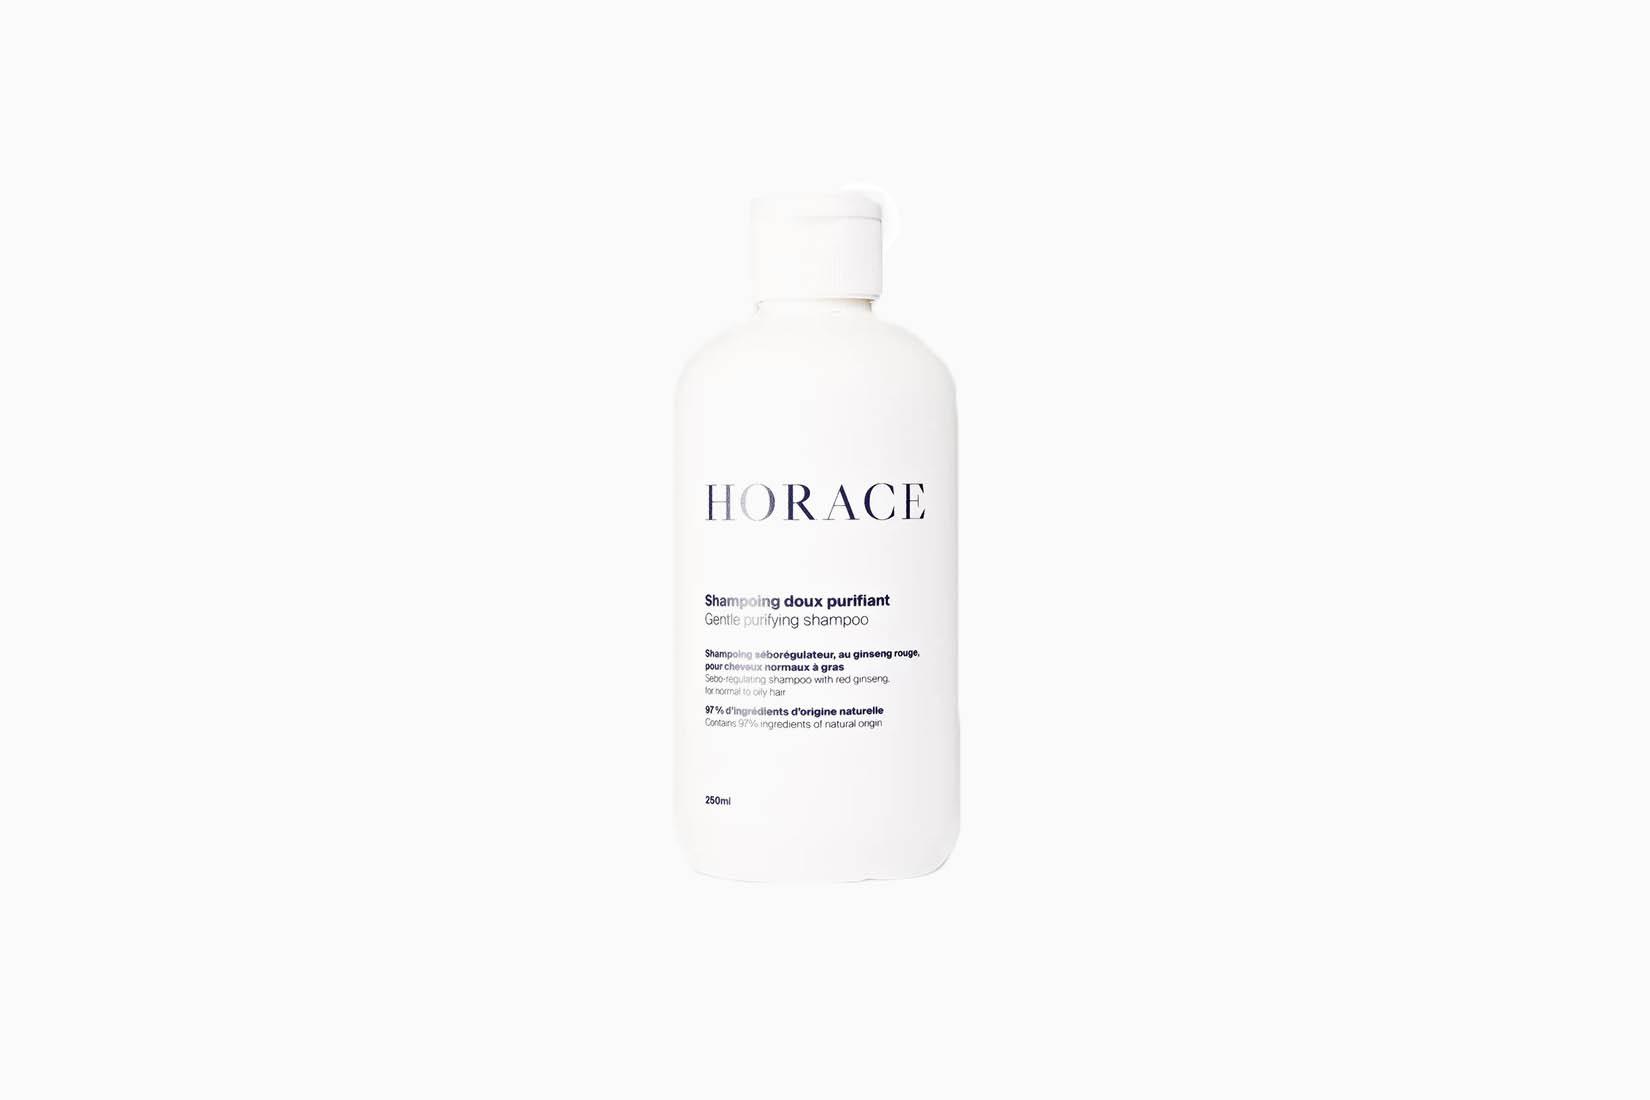 Best Hair Loss Shampoo Men Horace Review - Luxe Digital